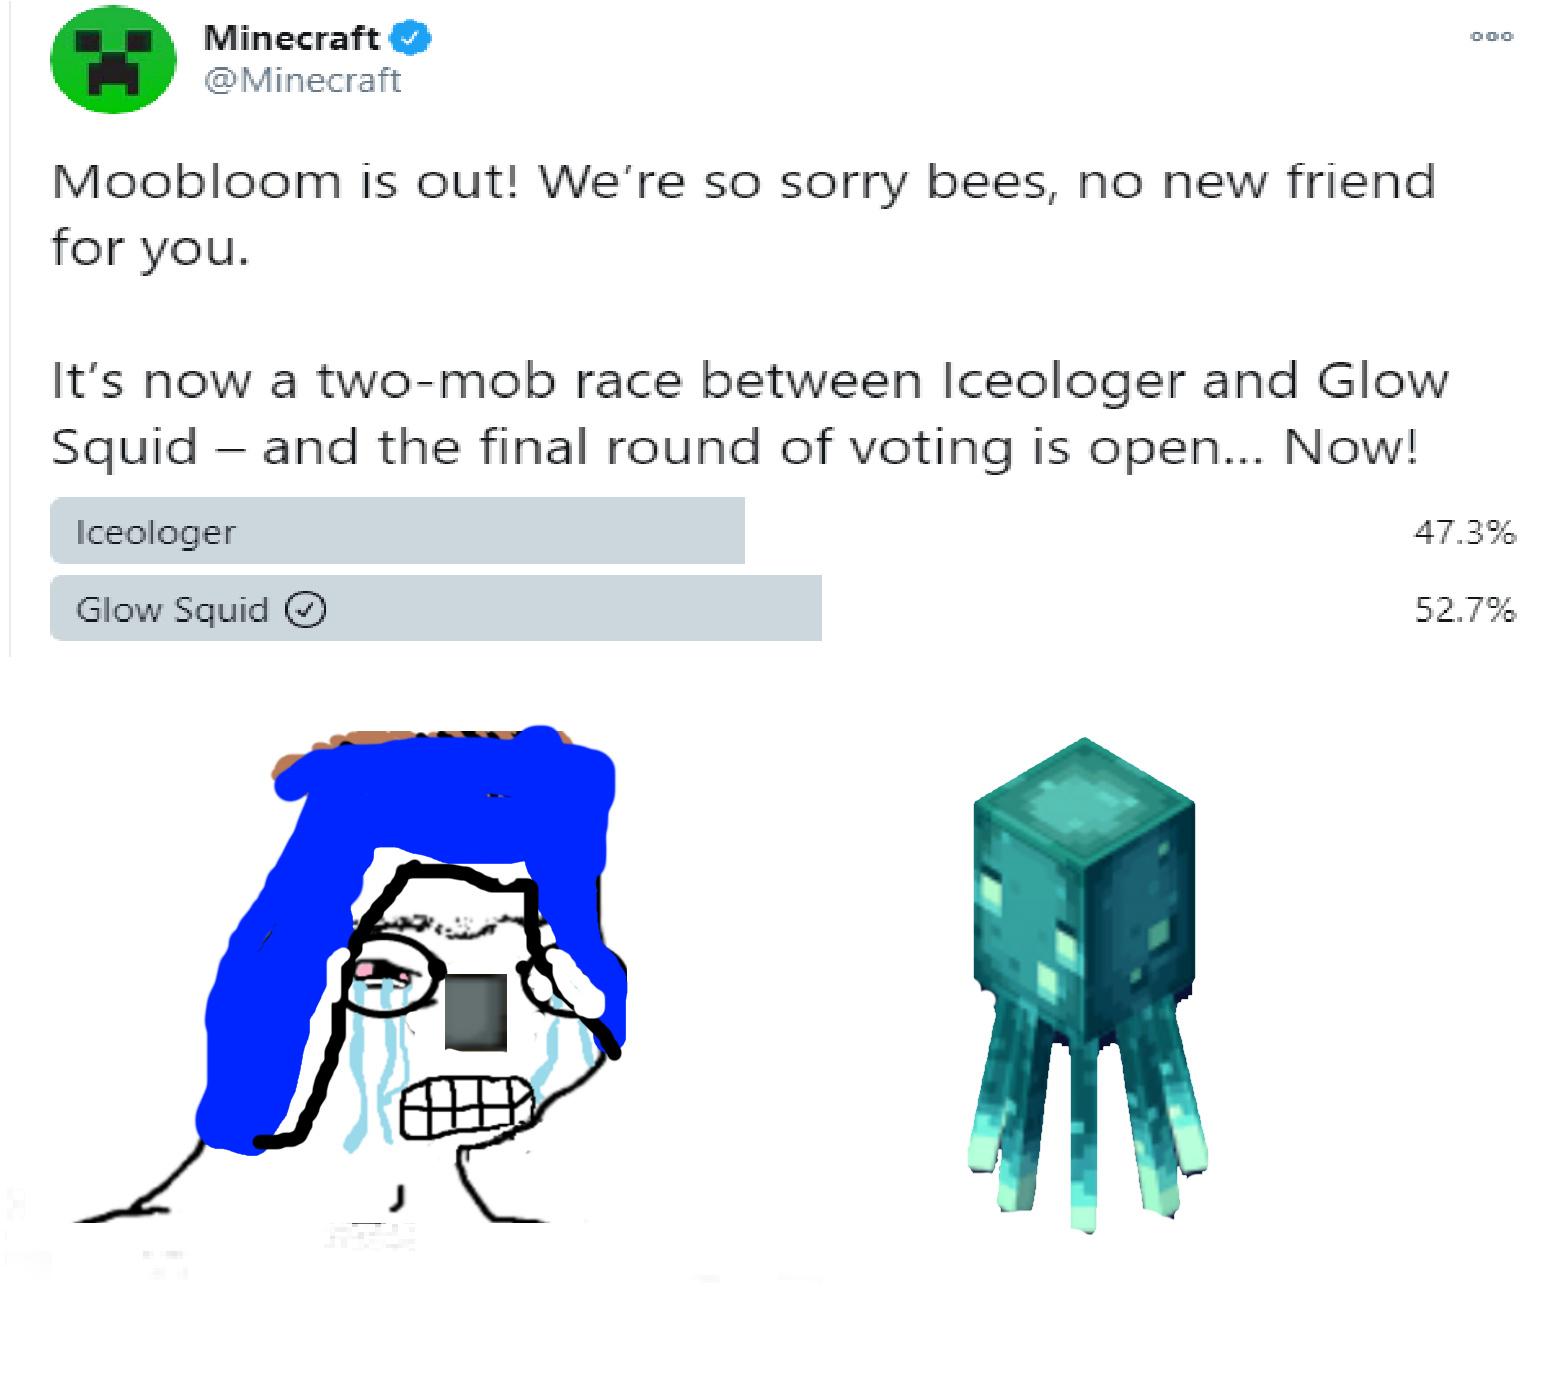 gano glow squid xd - meme